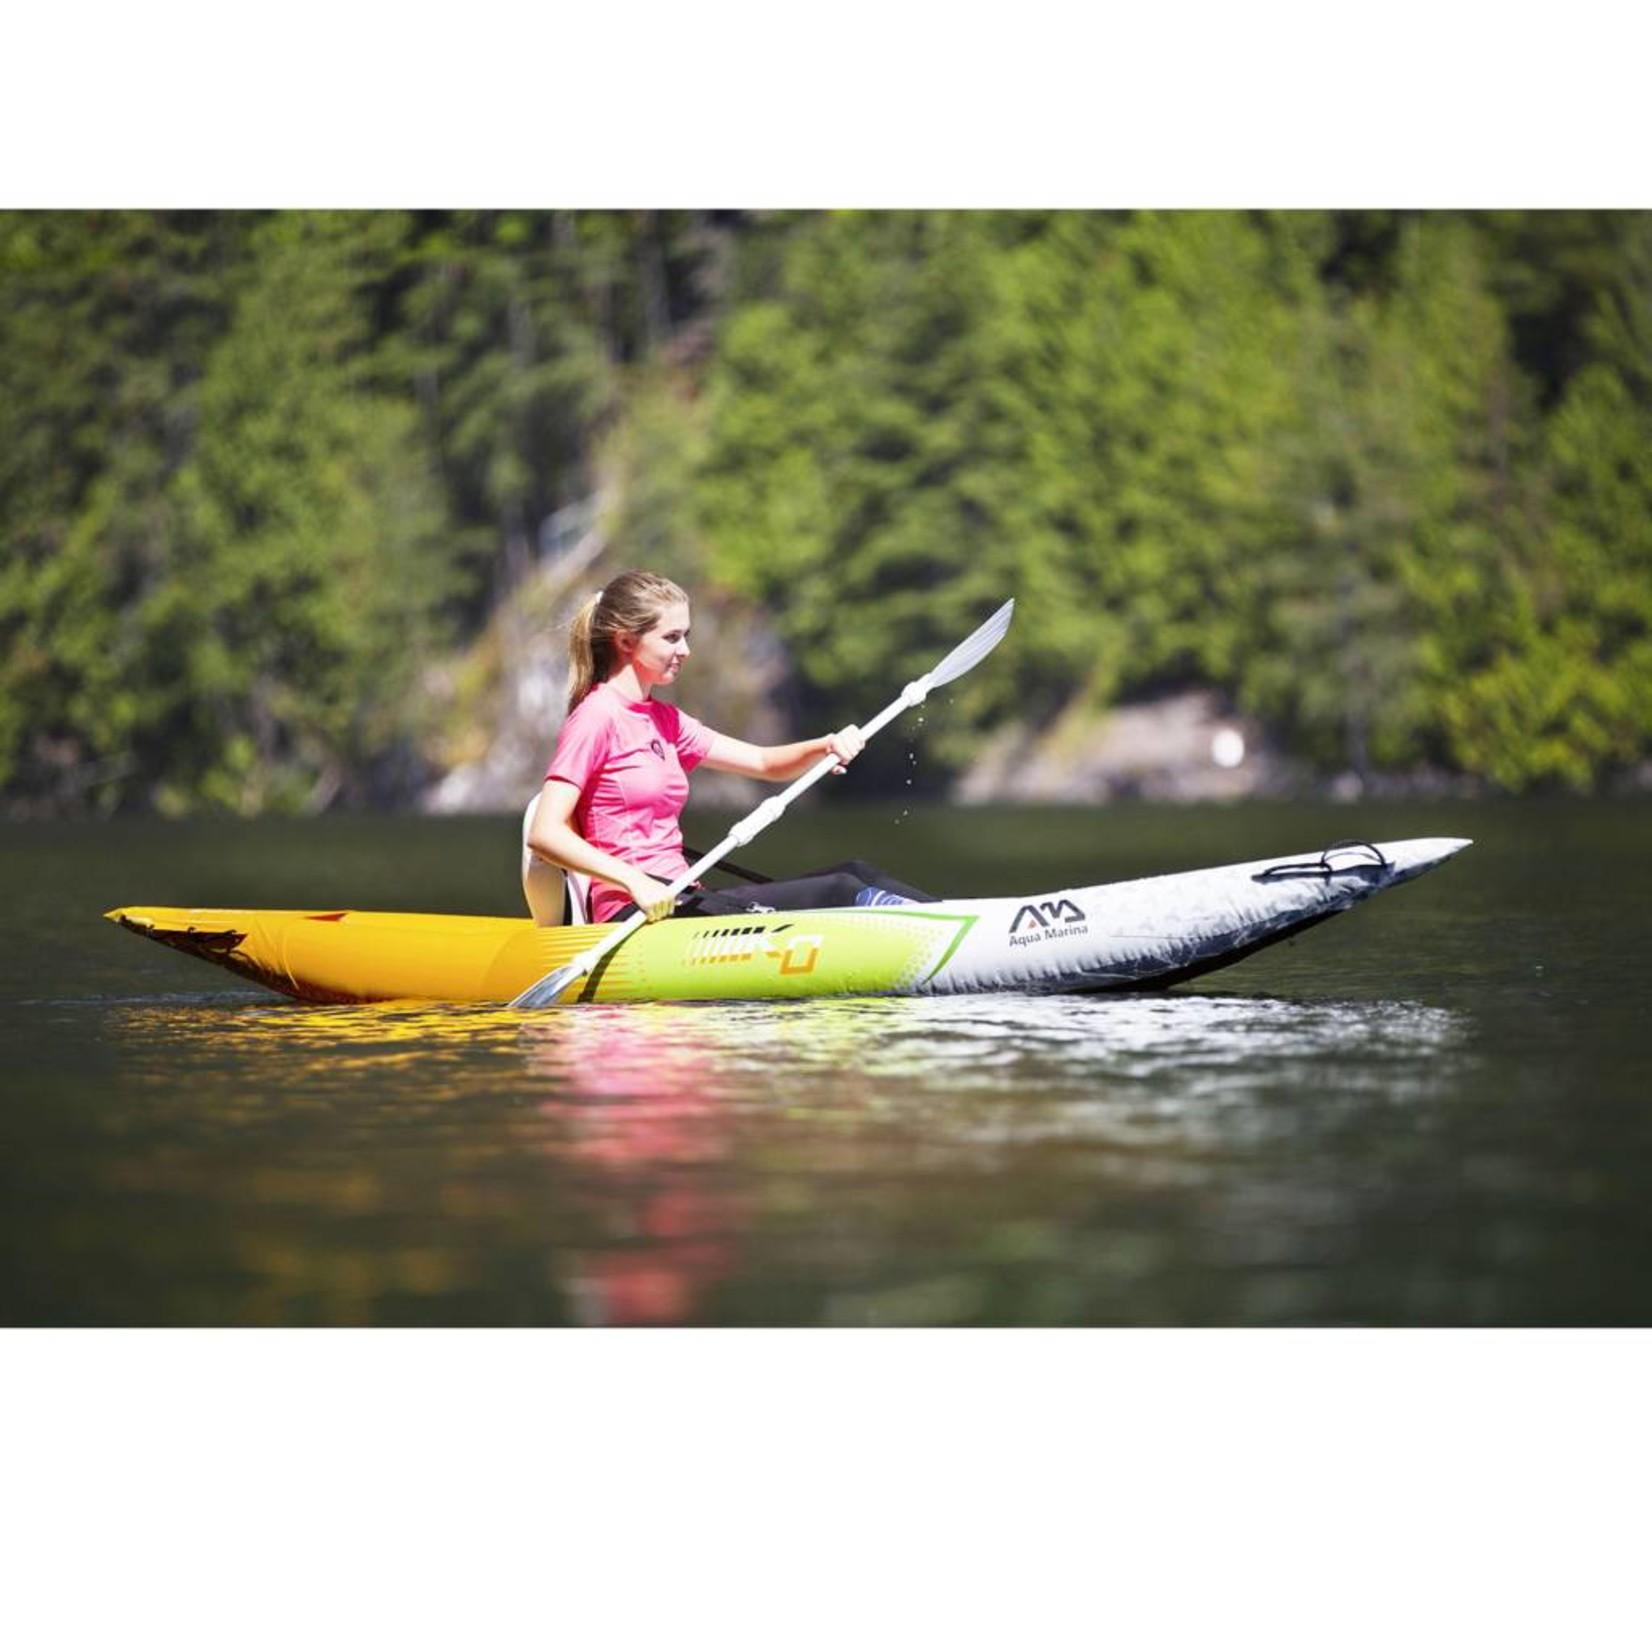 Aqua Marina Betta HM K0 One - Inflatable Kayak with Paddle